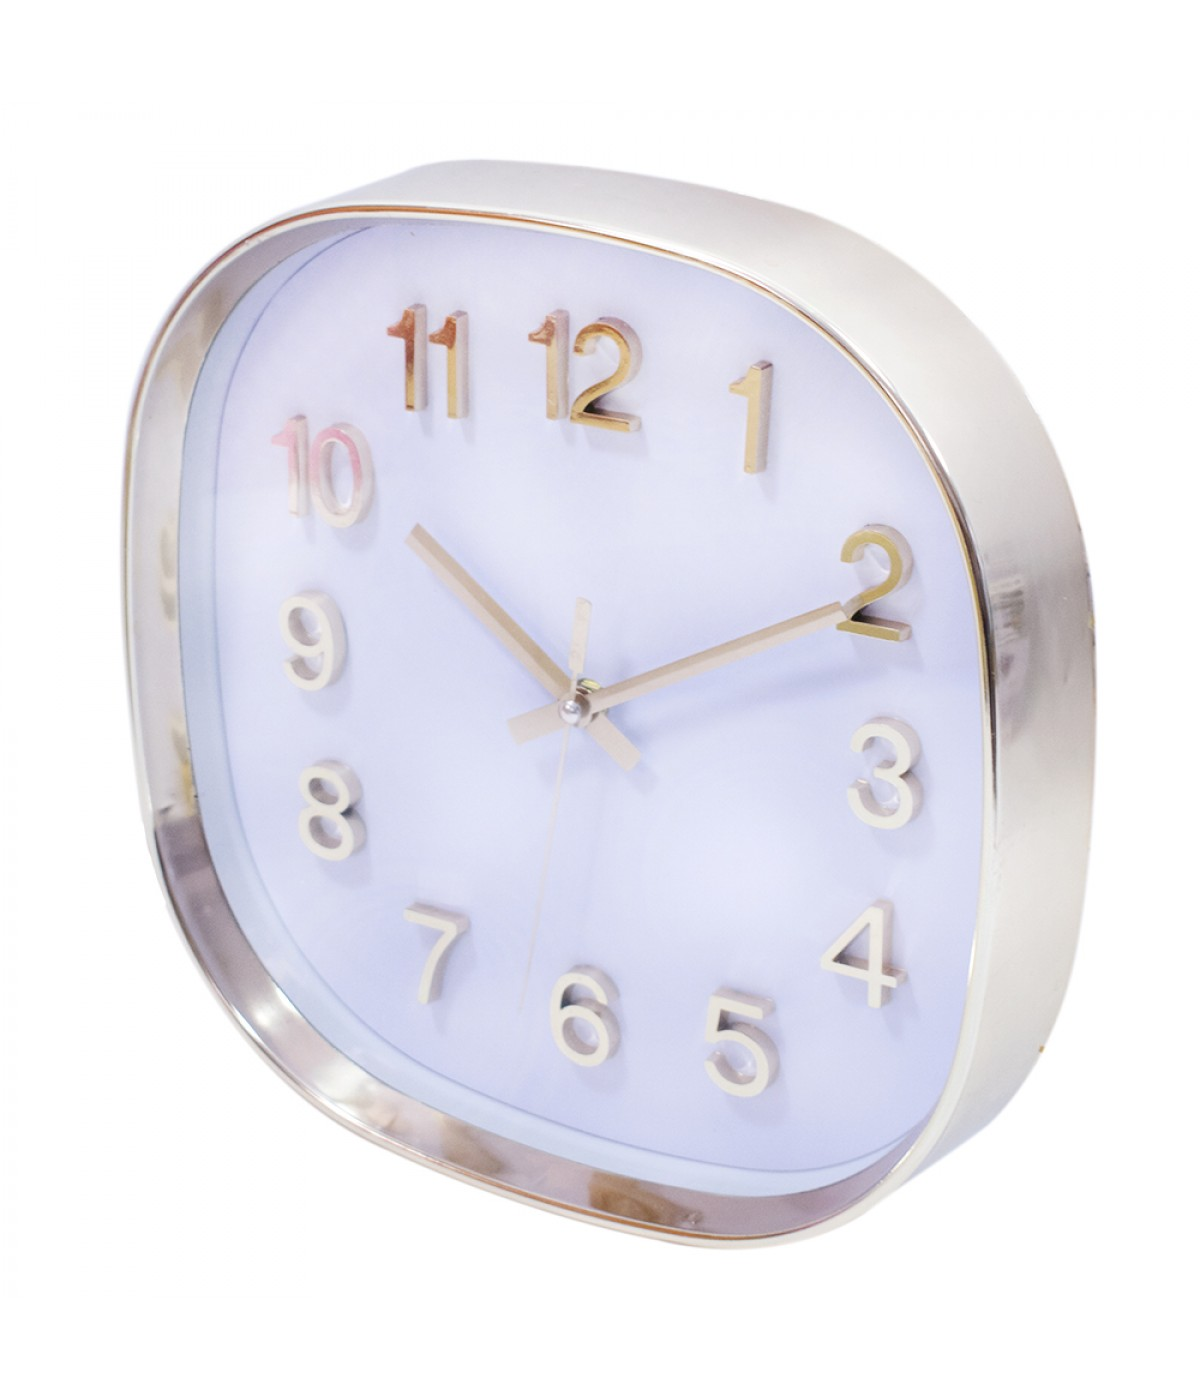 f40cbcfa393 Relógio Parede Bronze 30x30cm